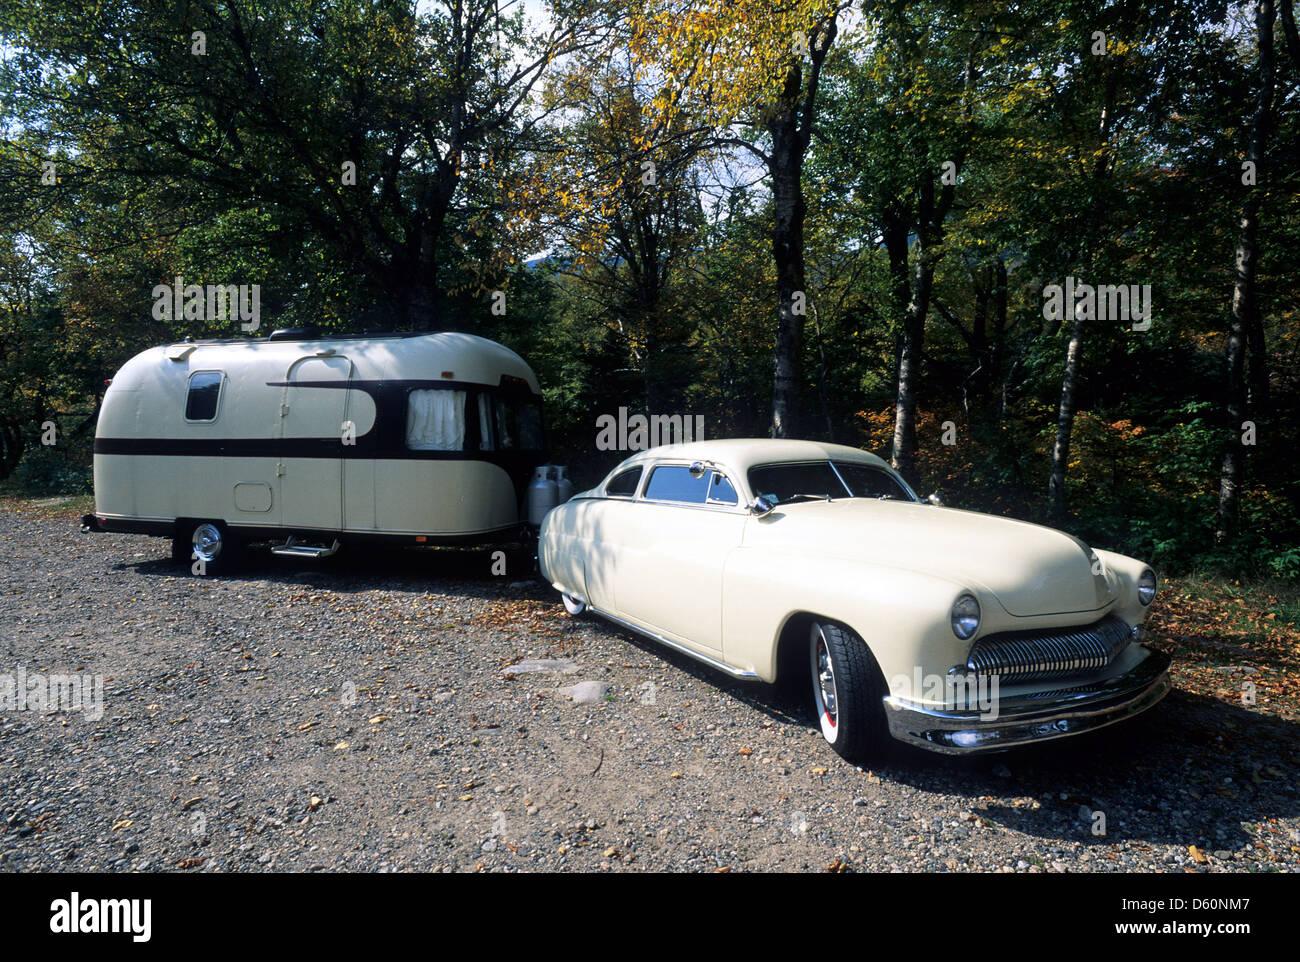 Travel Trailer Vintage Stock Photos & Travel Trailer Vintage Stock ...